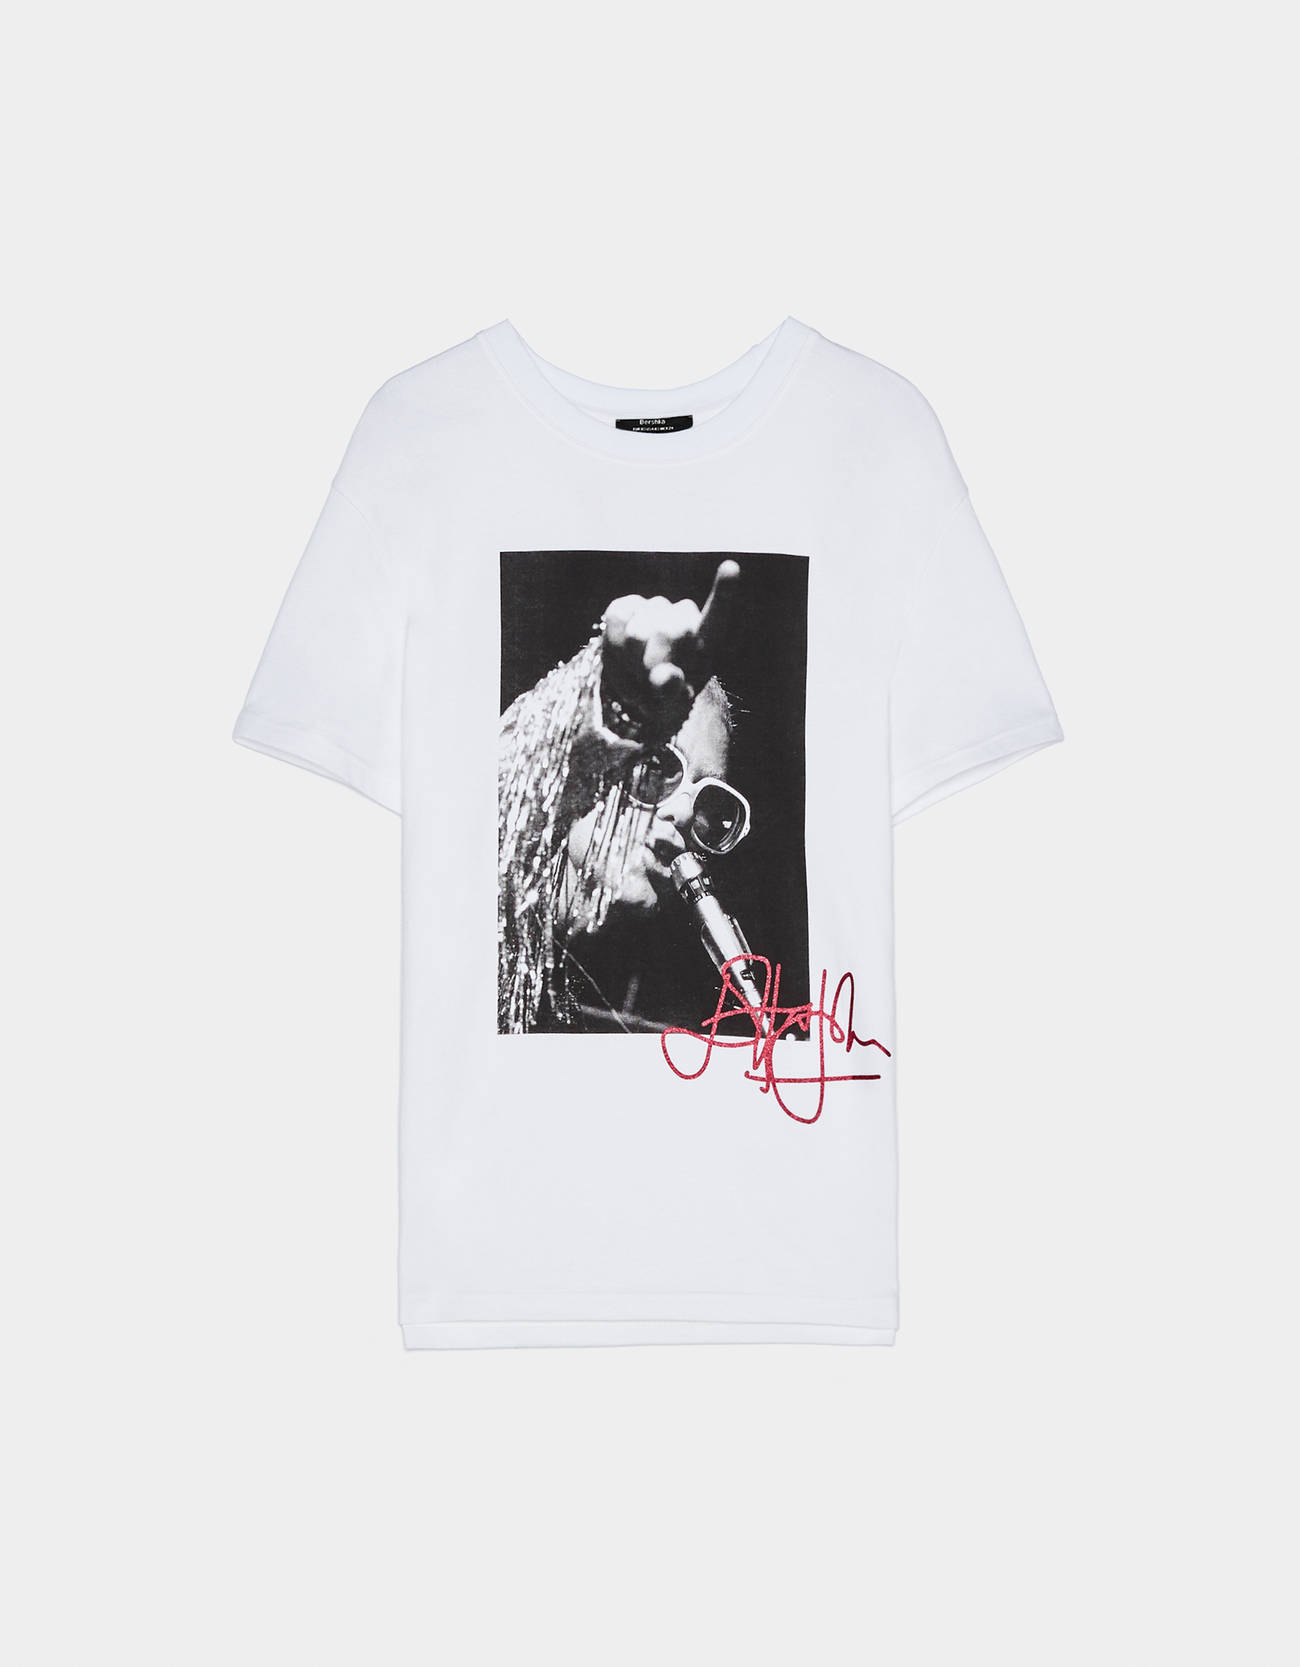 nuevo estilo pero no vulgar Página web oficial Camiseta Elton John